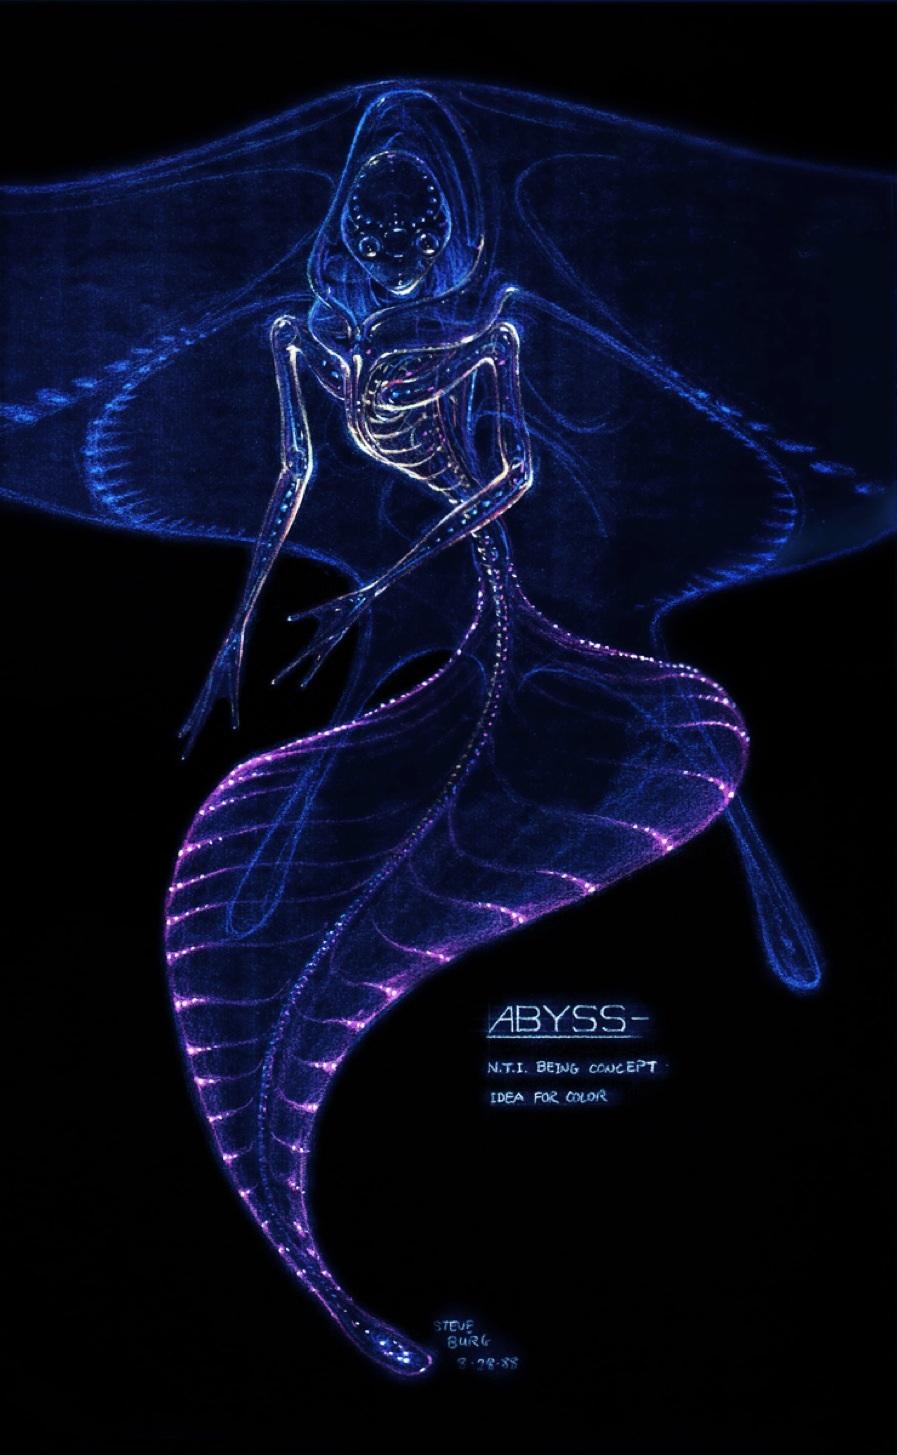 http://3.bp.blogspot.com/_60A8zsWp2jY/TNubBs5NYvI/AAAAAAAAAis/t7iSq2y_Bik/s1600/Abyss_NTI_being.jpg